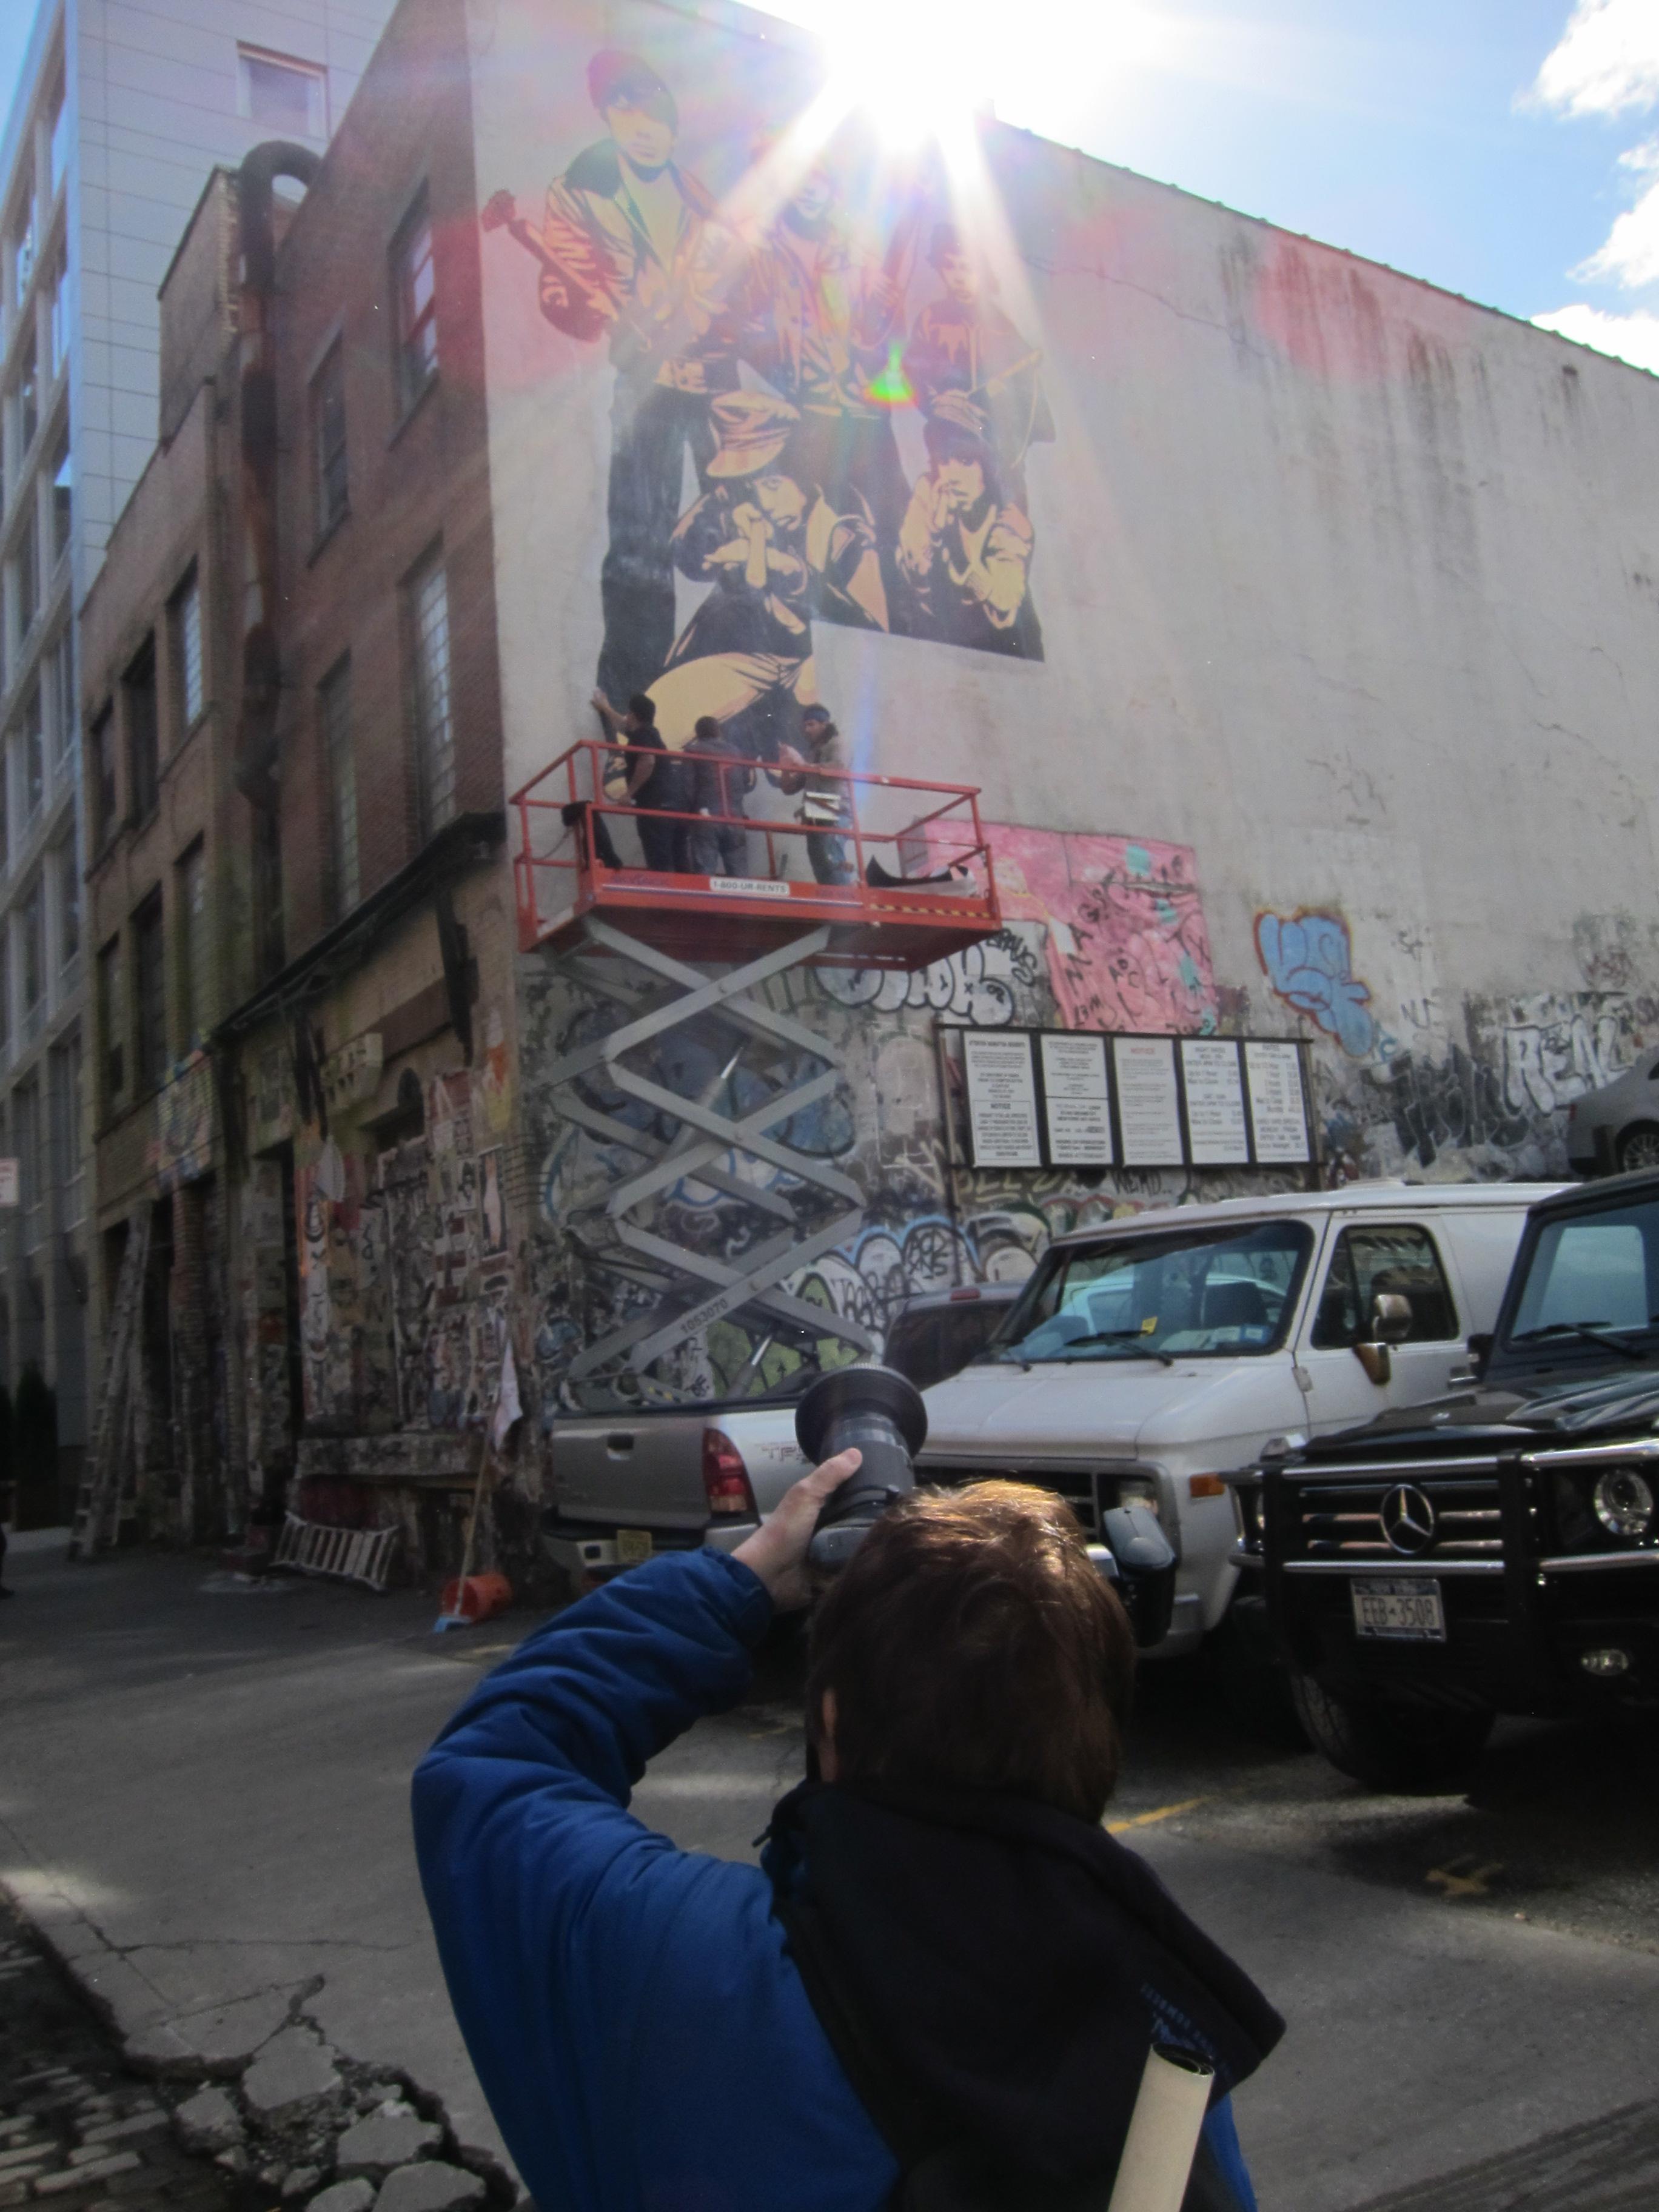 Martha shoots Shepard making a mural of the image Martha shot.